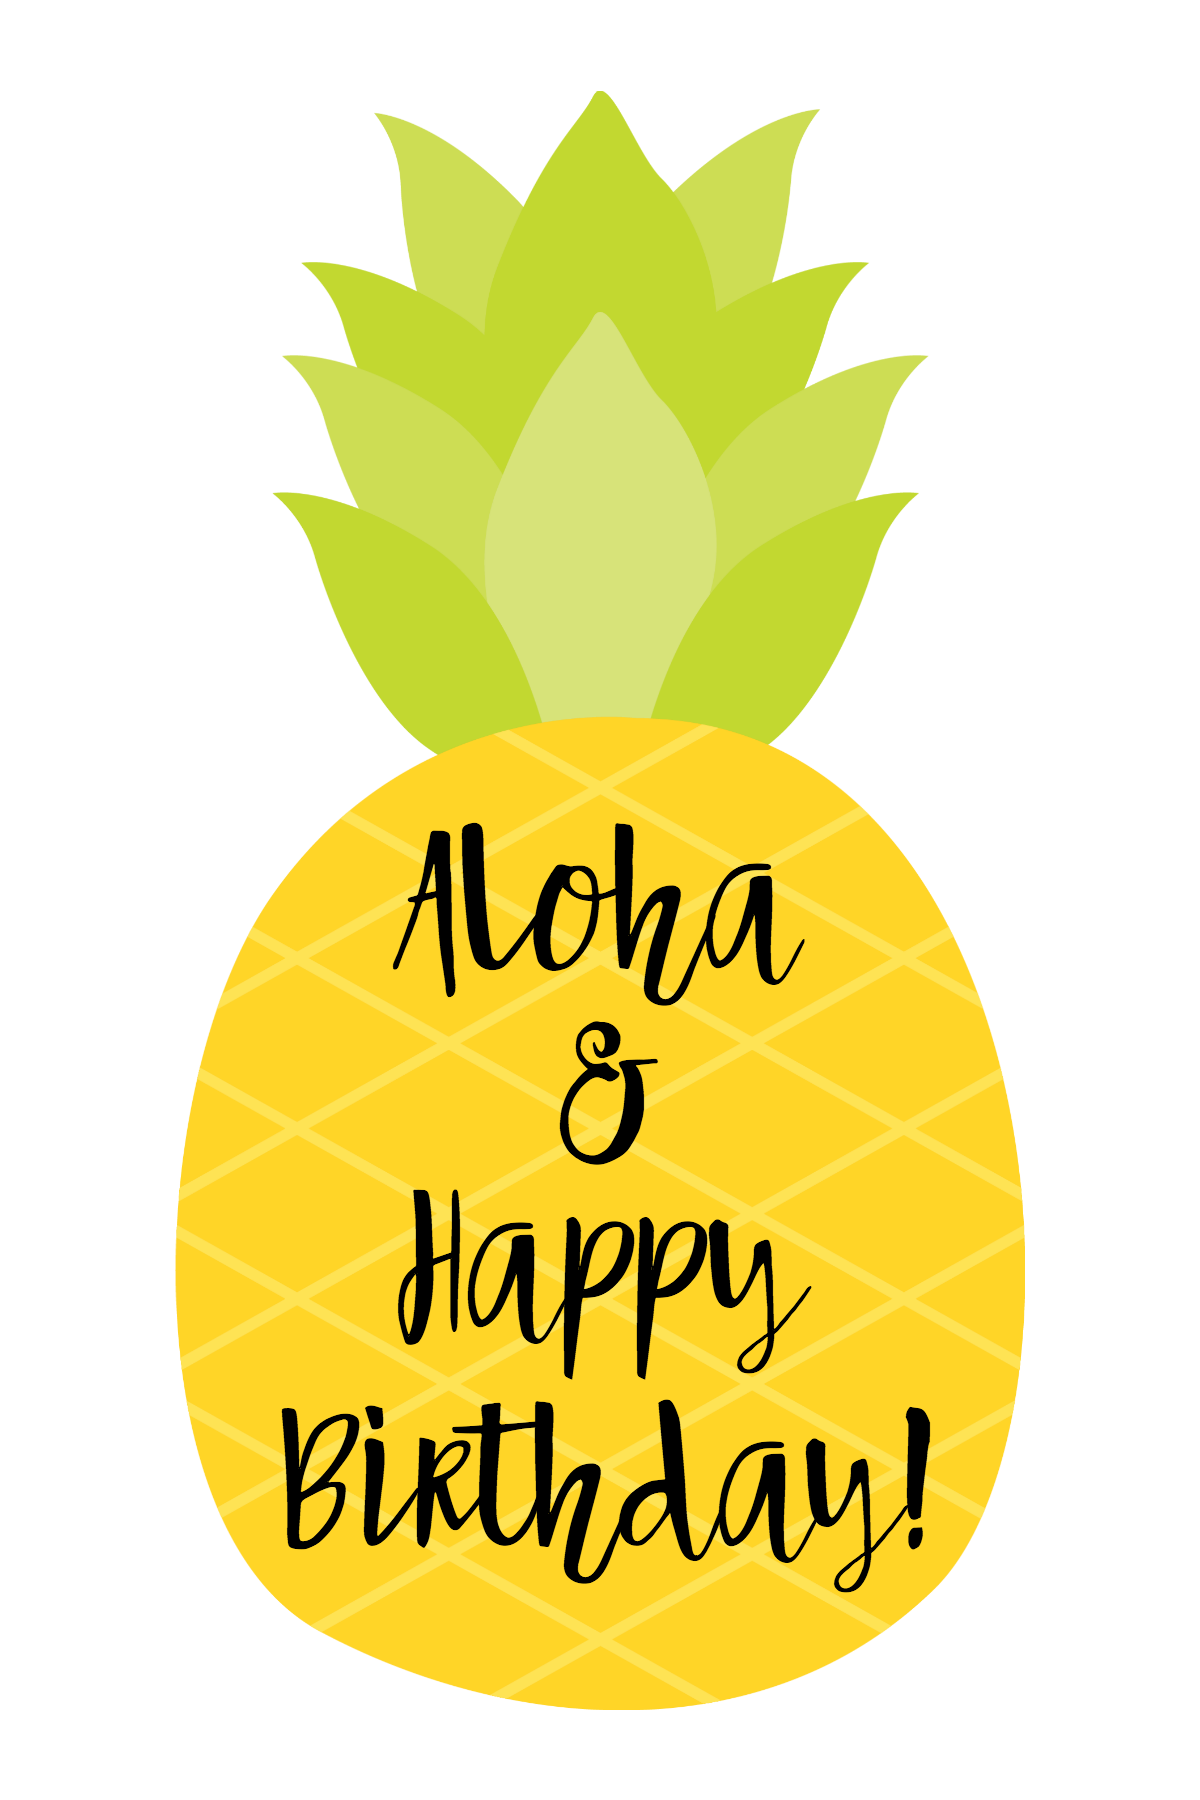 Pineapple Gift Idea Fun Squared